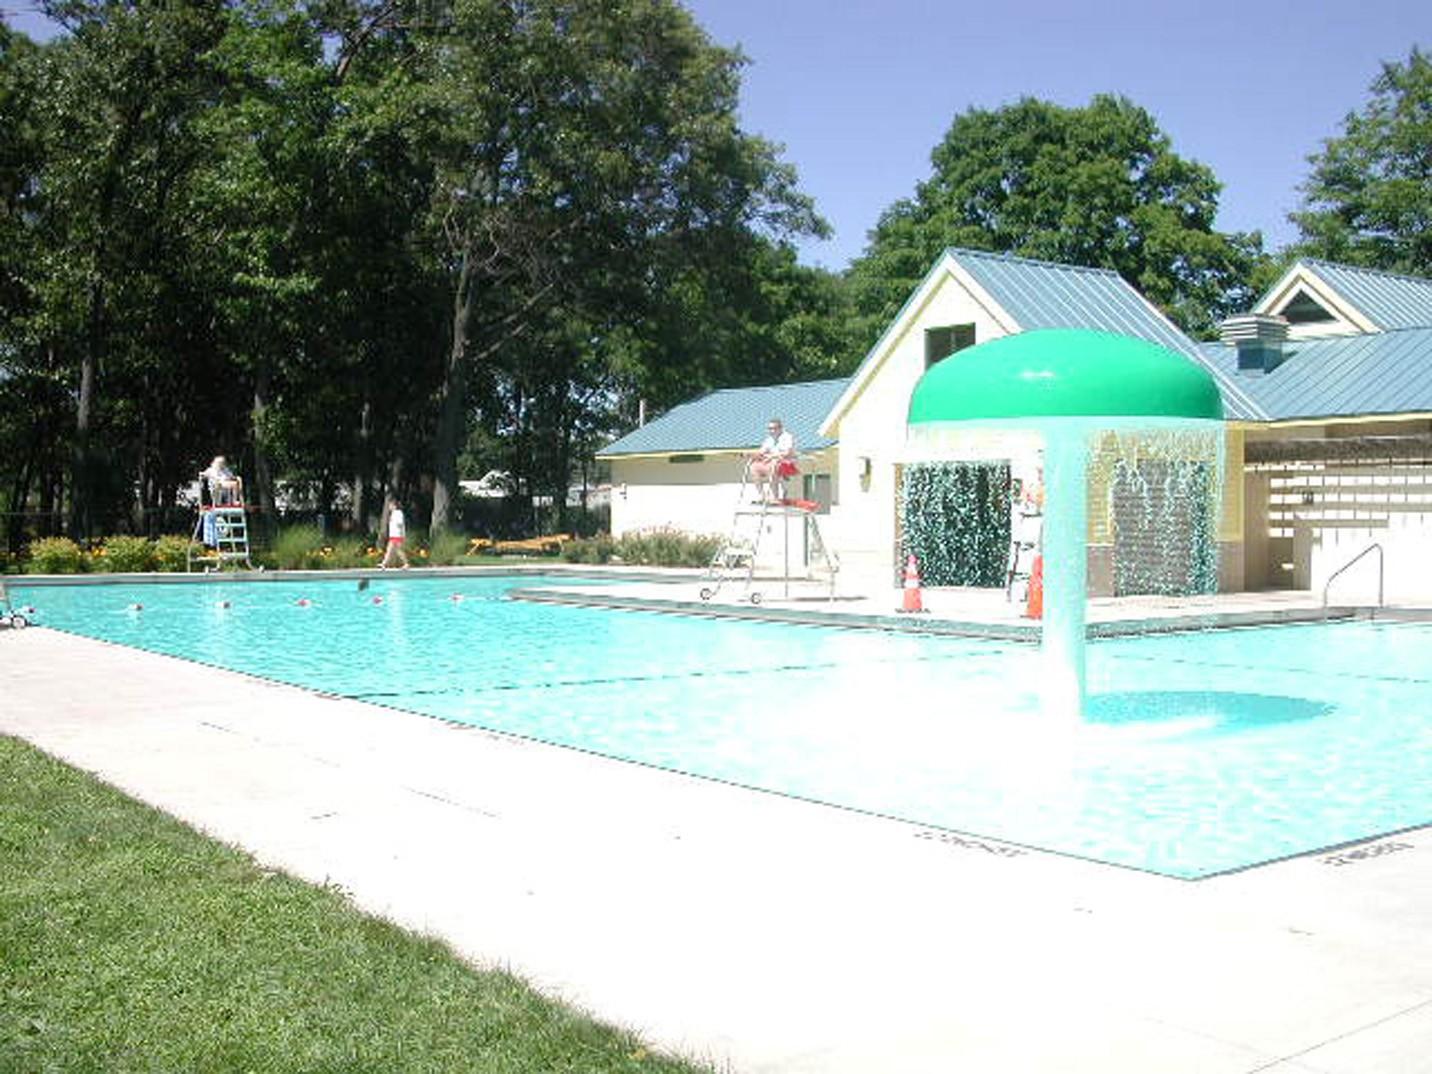 Goodwin Amp Gorman Park Pools Tlb Architecture